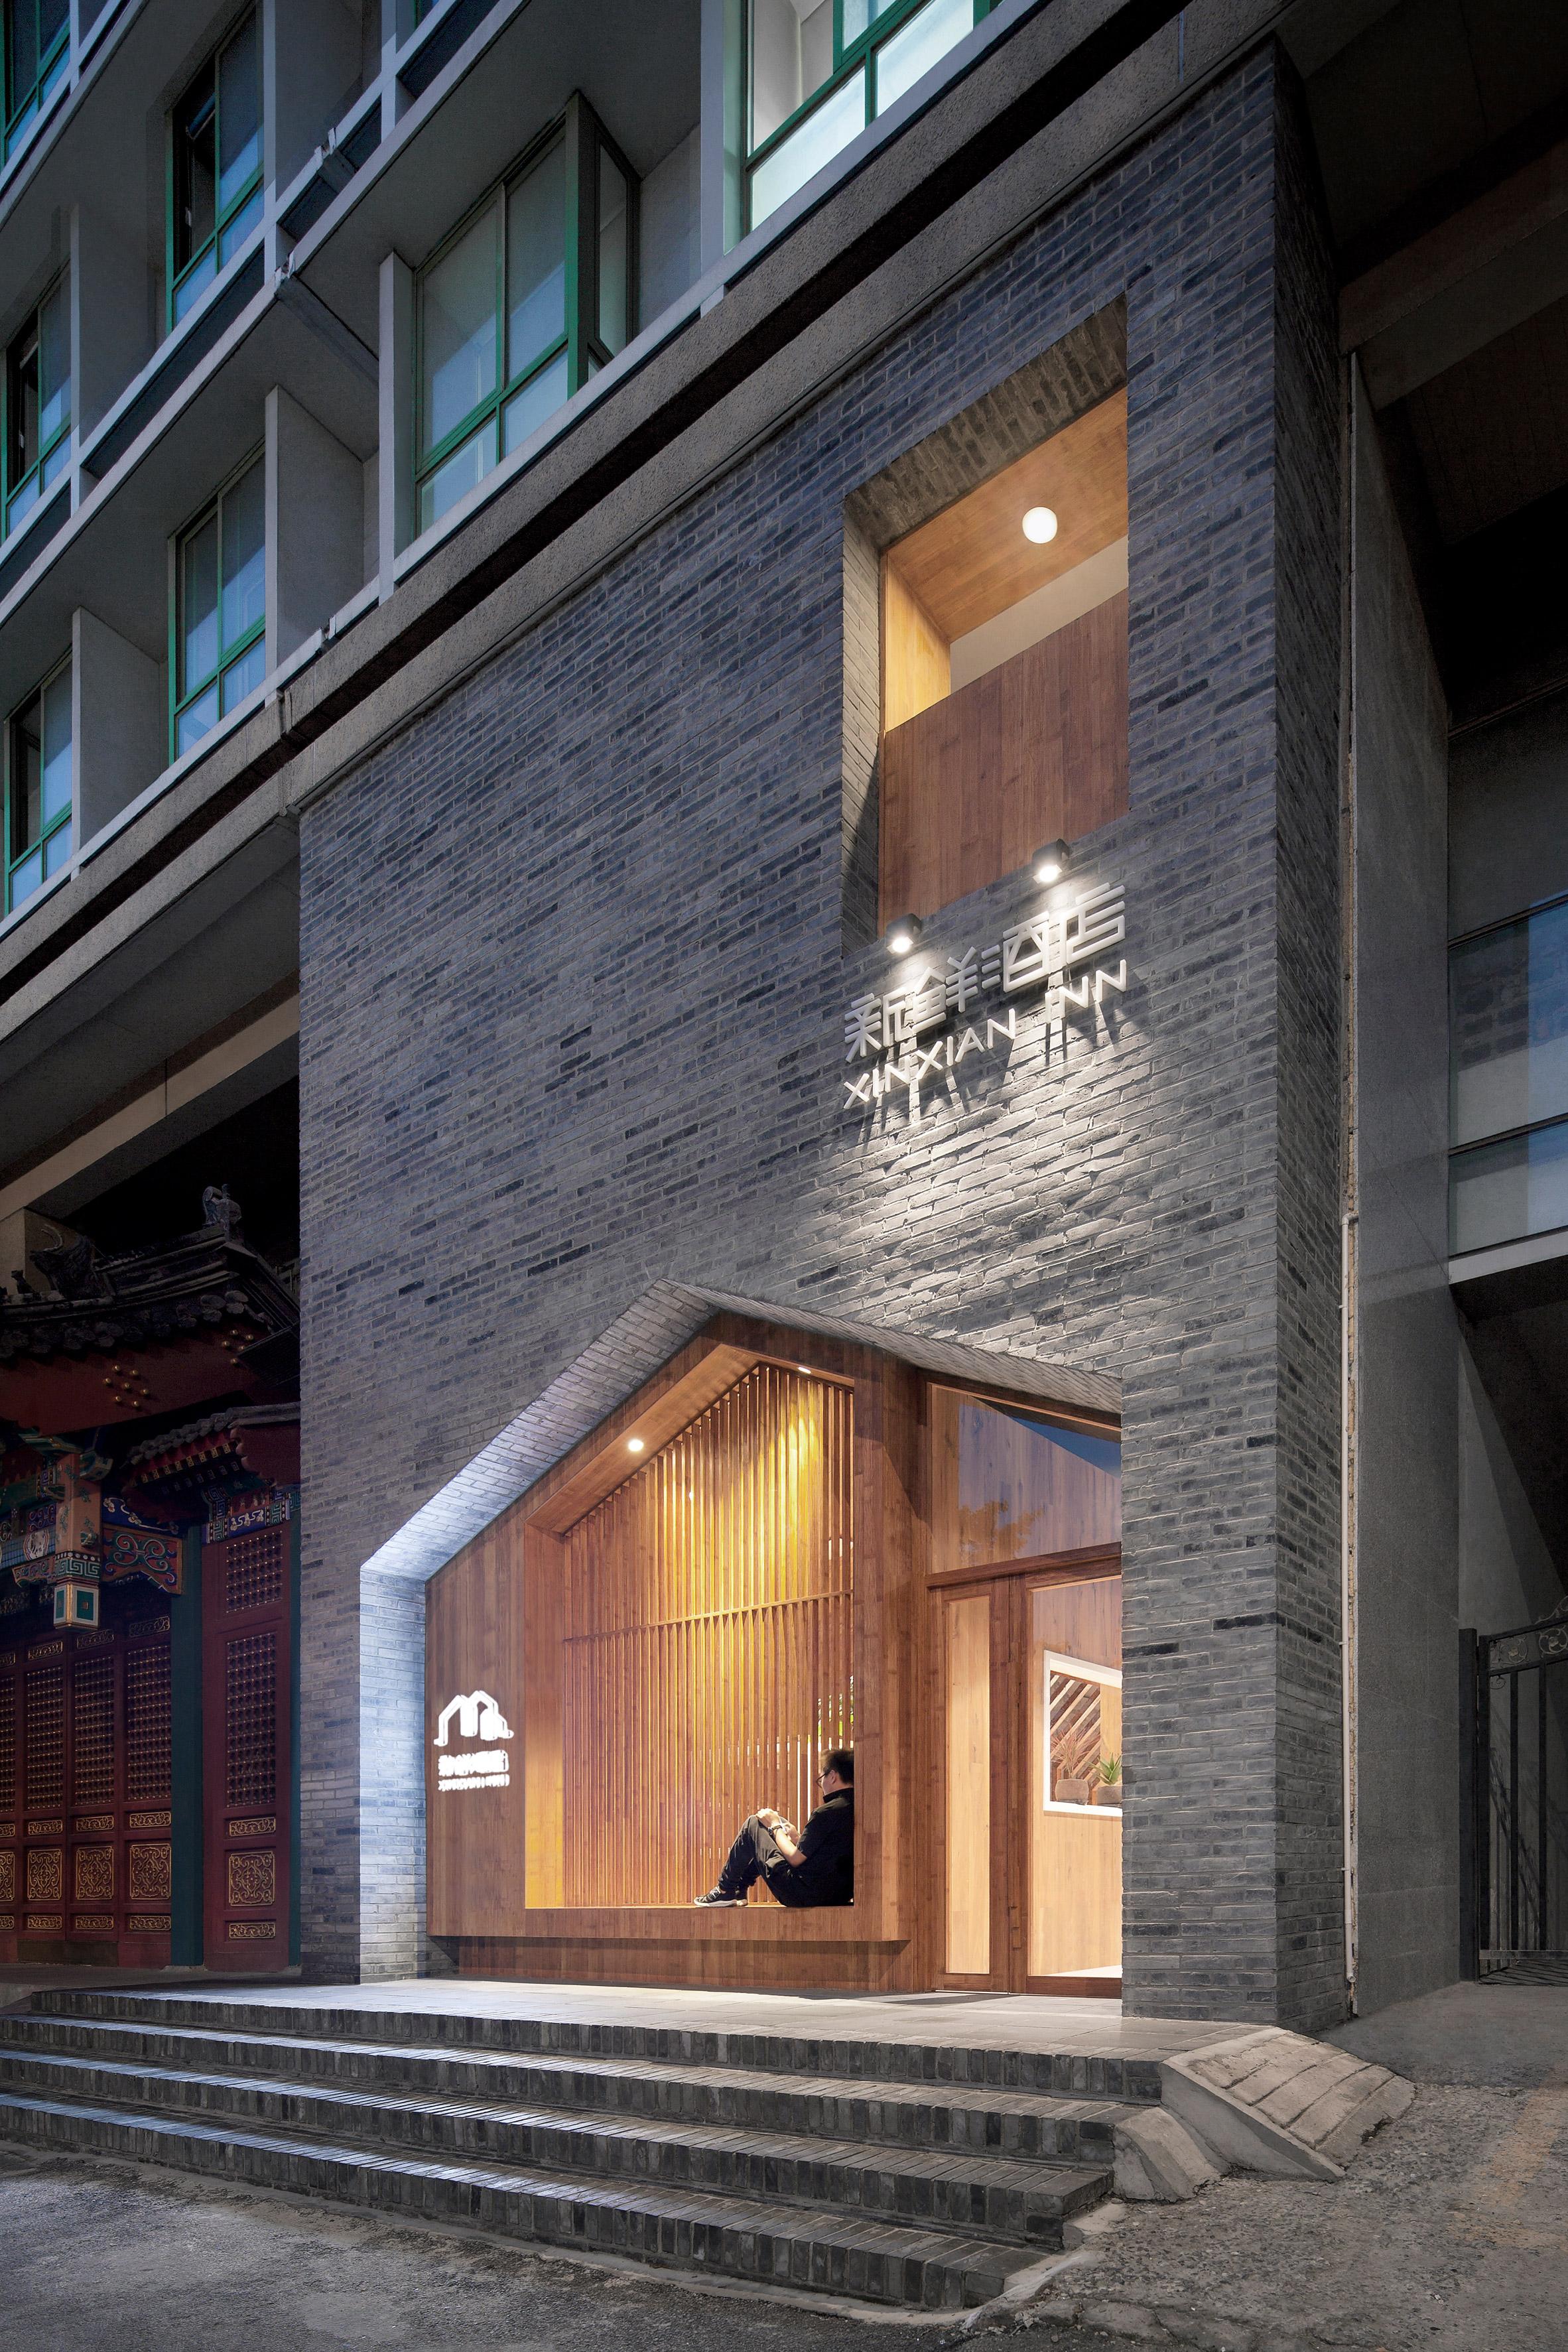 Penda inserts house-shaped opening into facade of hotel in Beijing's XinXian Hutong